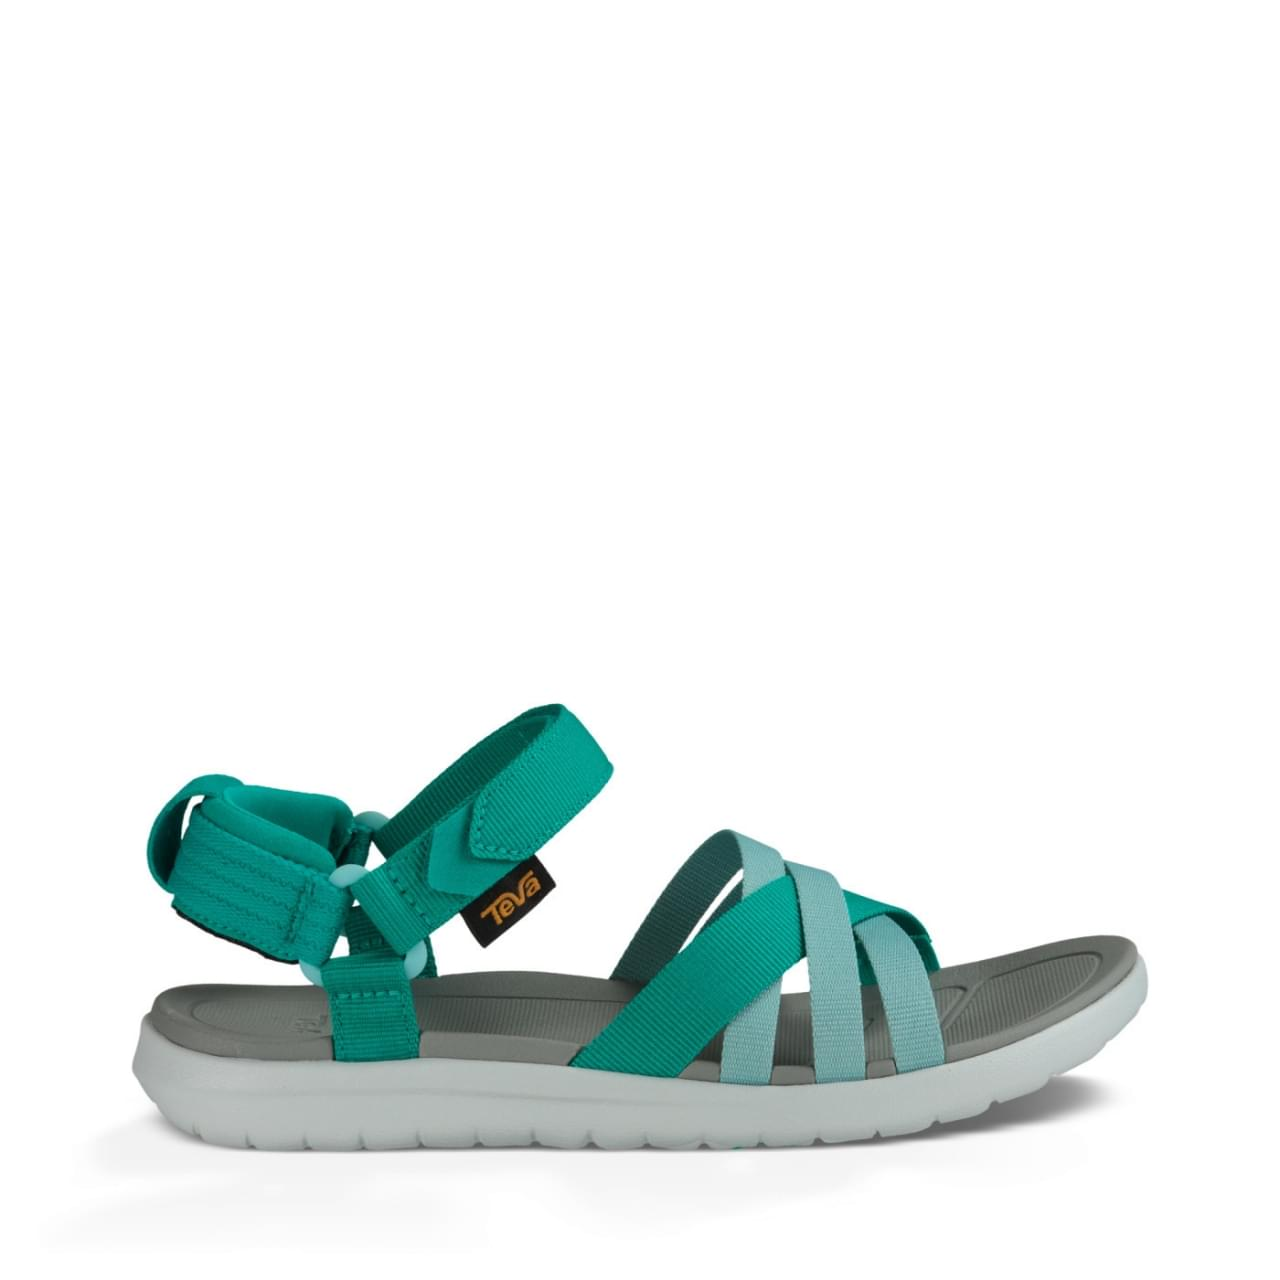 Teva Sanborn Sandal Dames